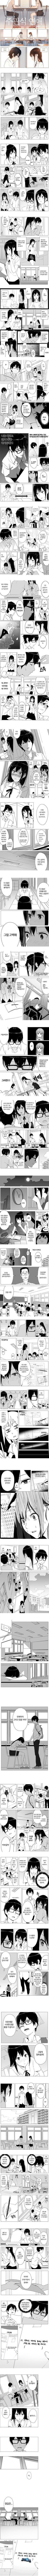 Drawing Practice, Funny Comics, Manga Anime, Drawings, Cute, Funny, Kawaii, Drawing Exercises, Sketches